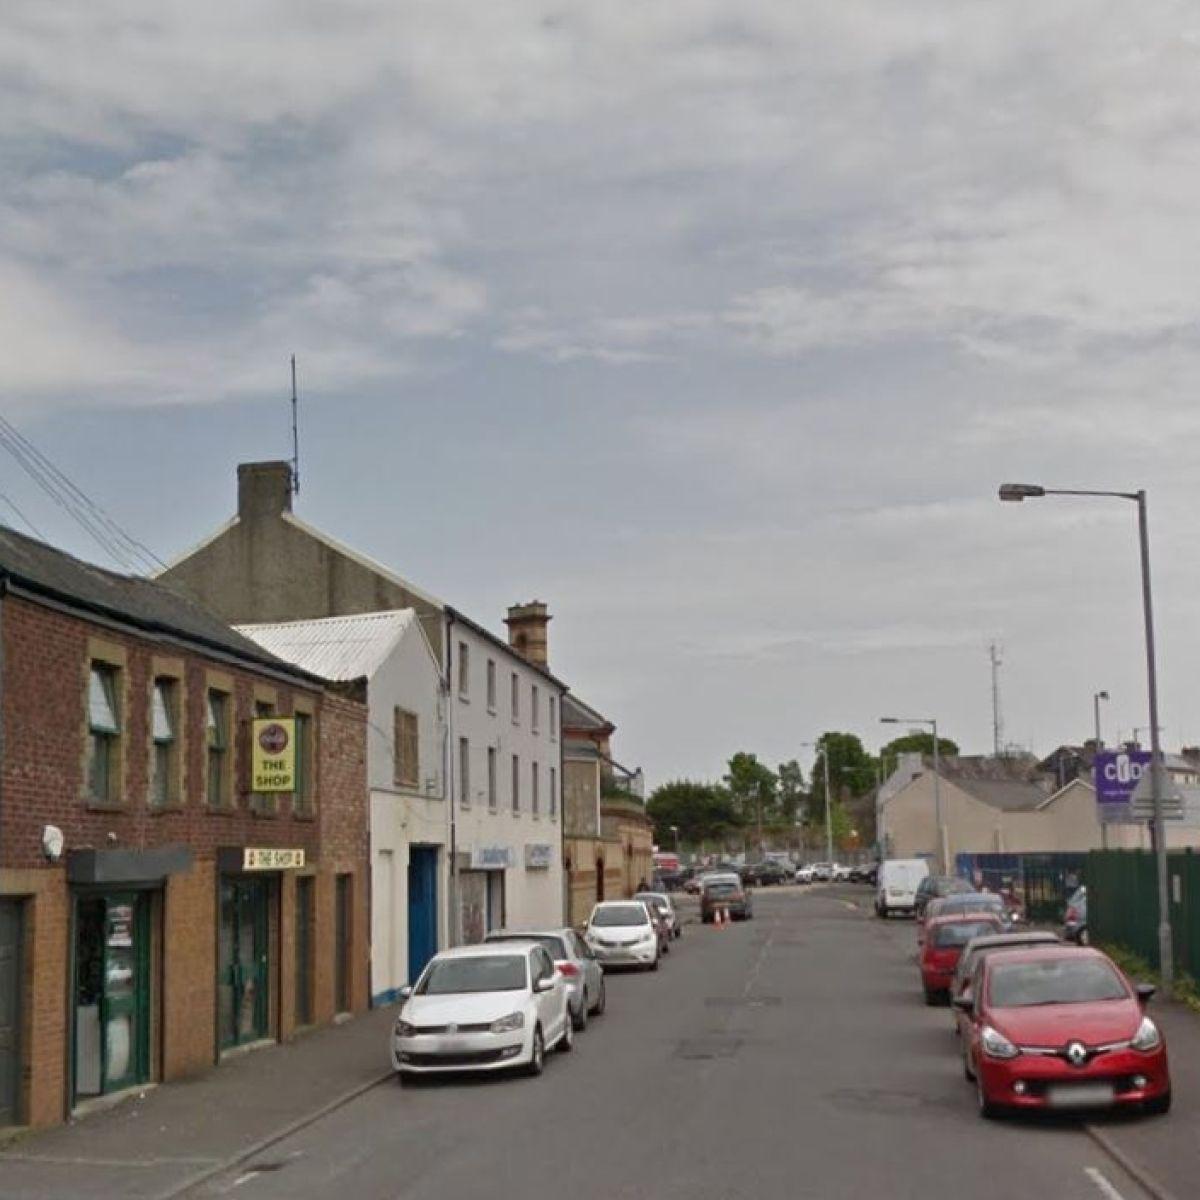 Legal highs' worth £800,000 seized in Portadown and Lurgan